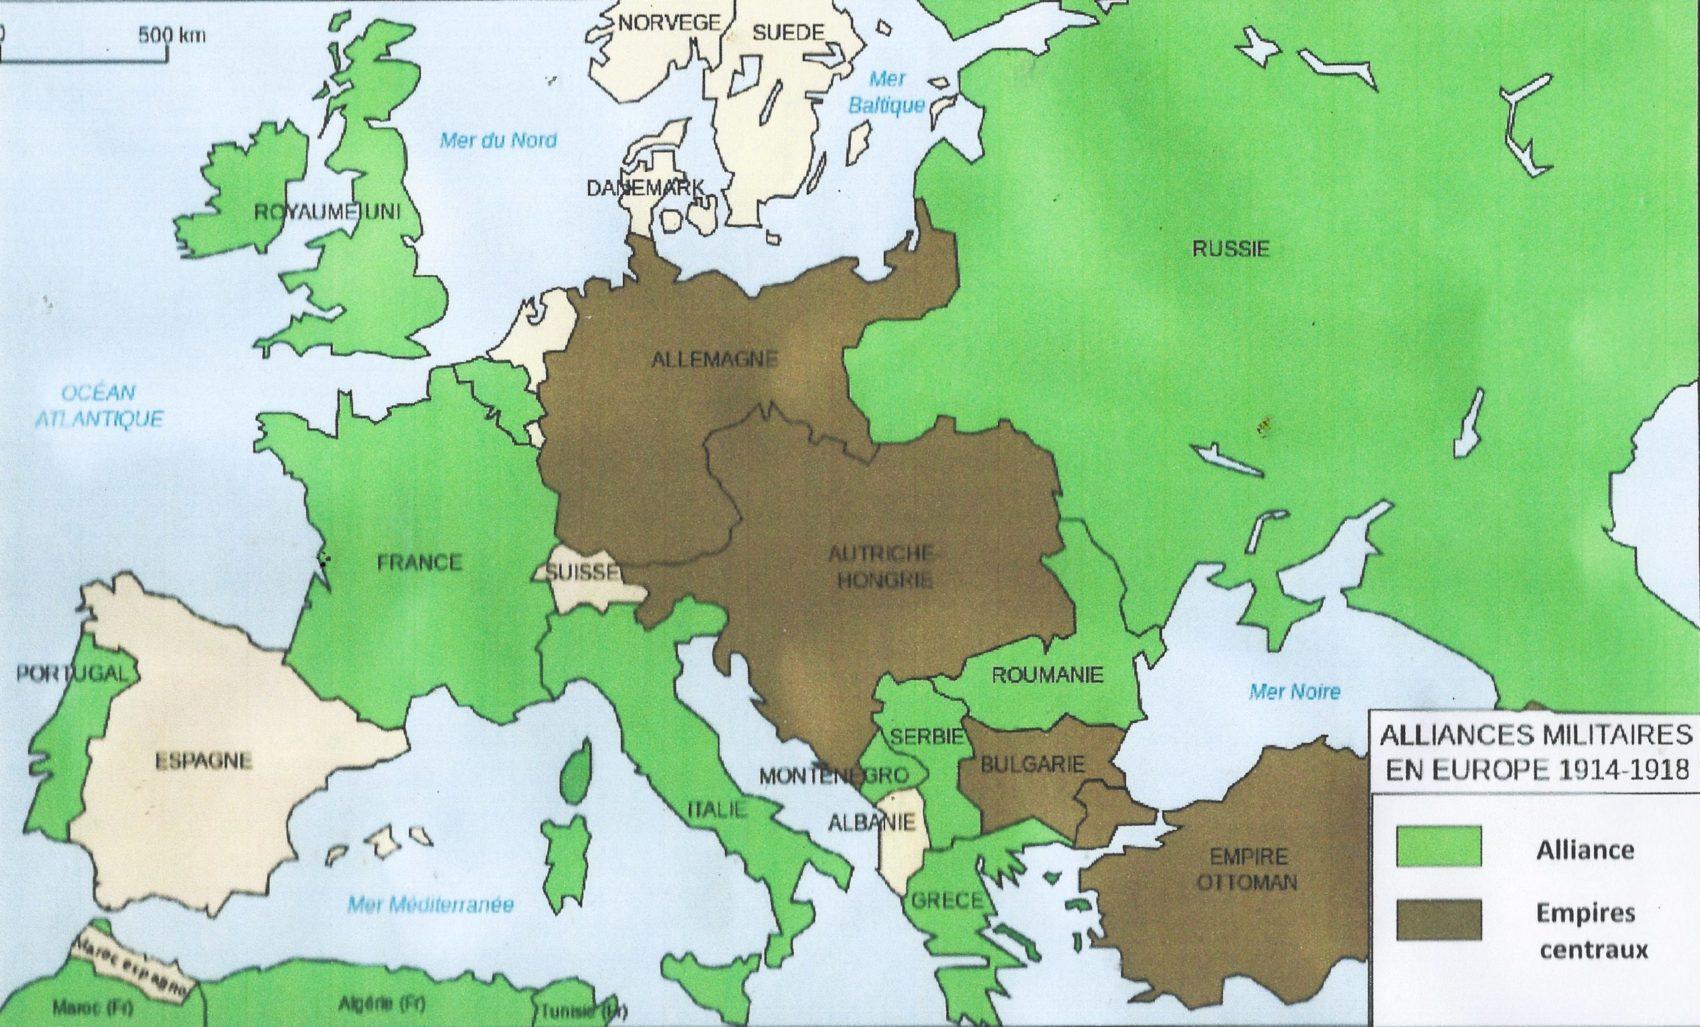 alliances-militaires carte